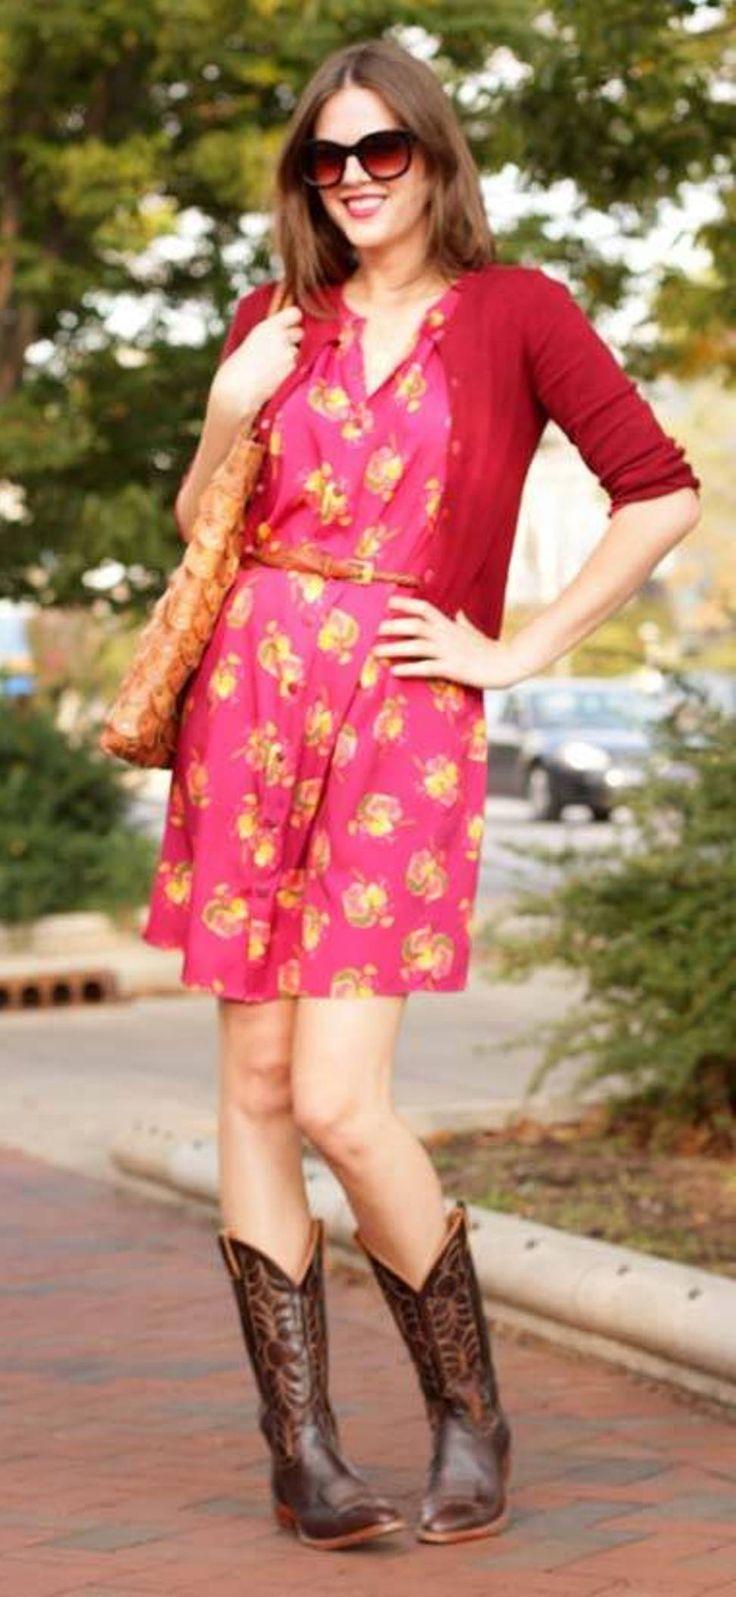 Red Cardigan Reddish Floral Dress Brown Boots Cowboy